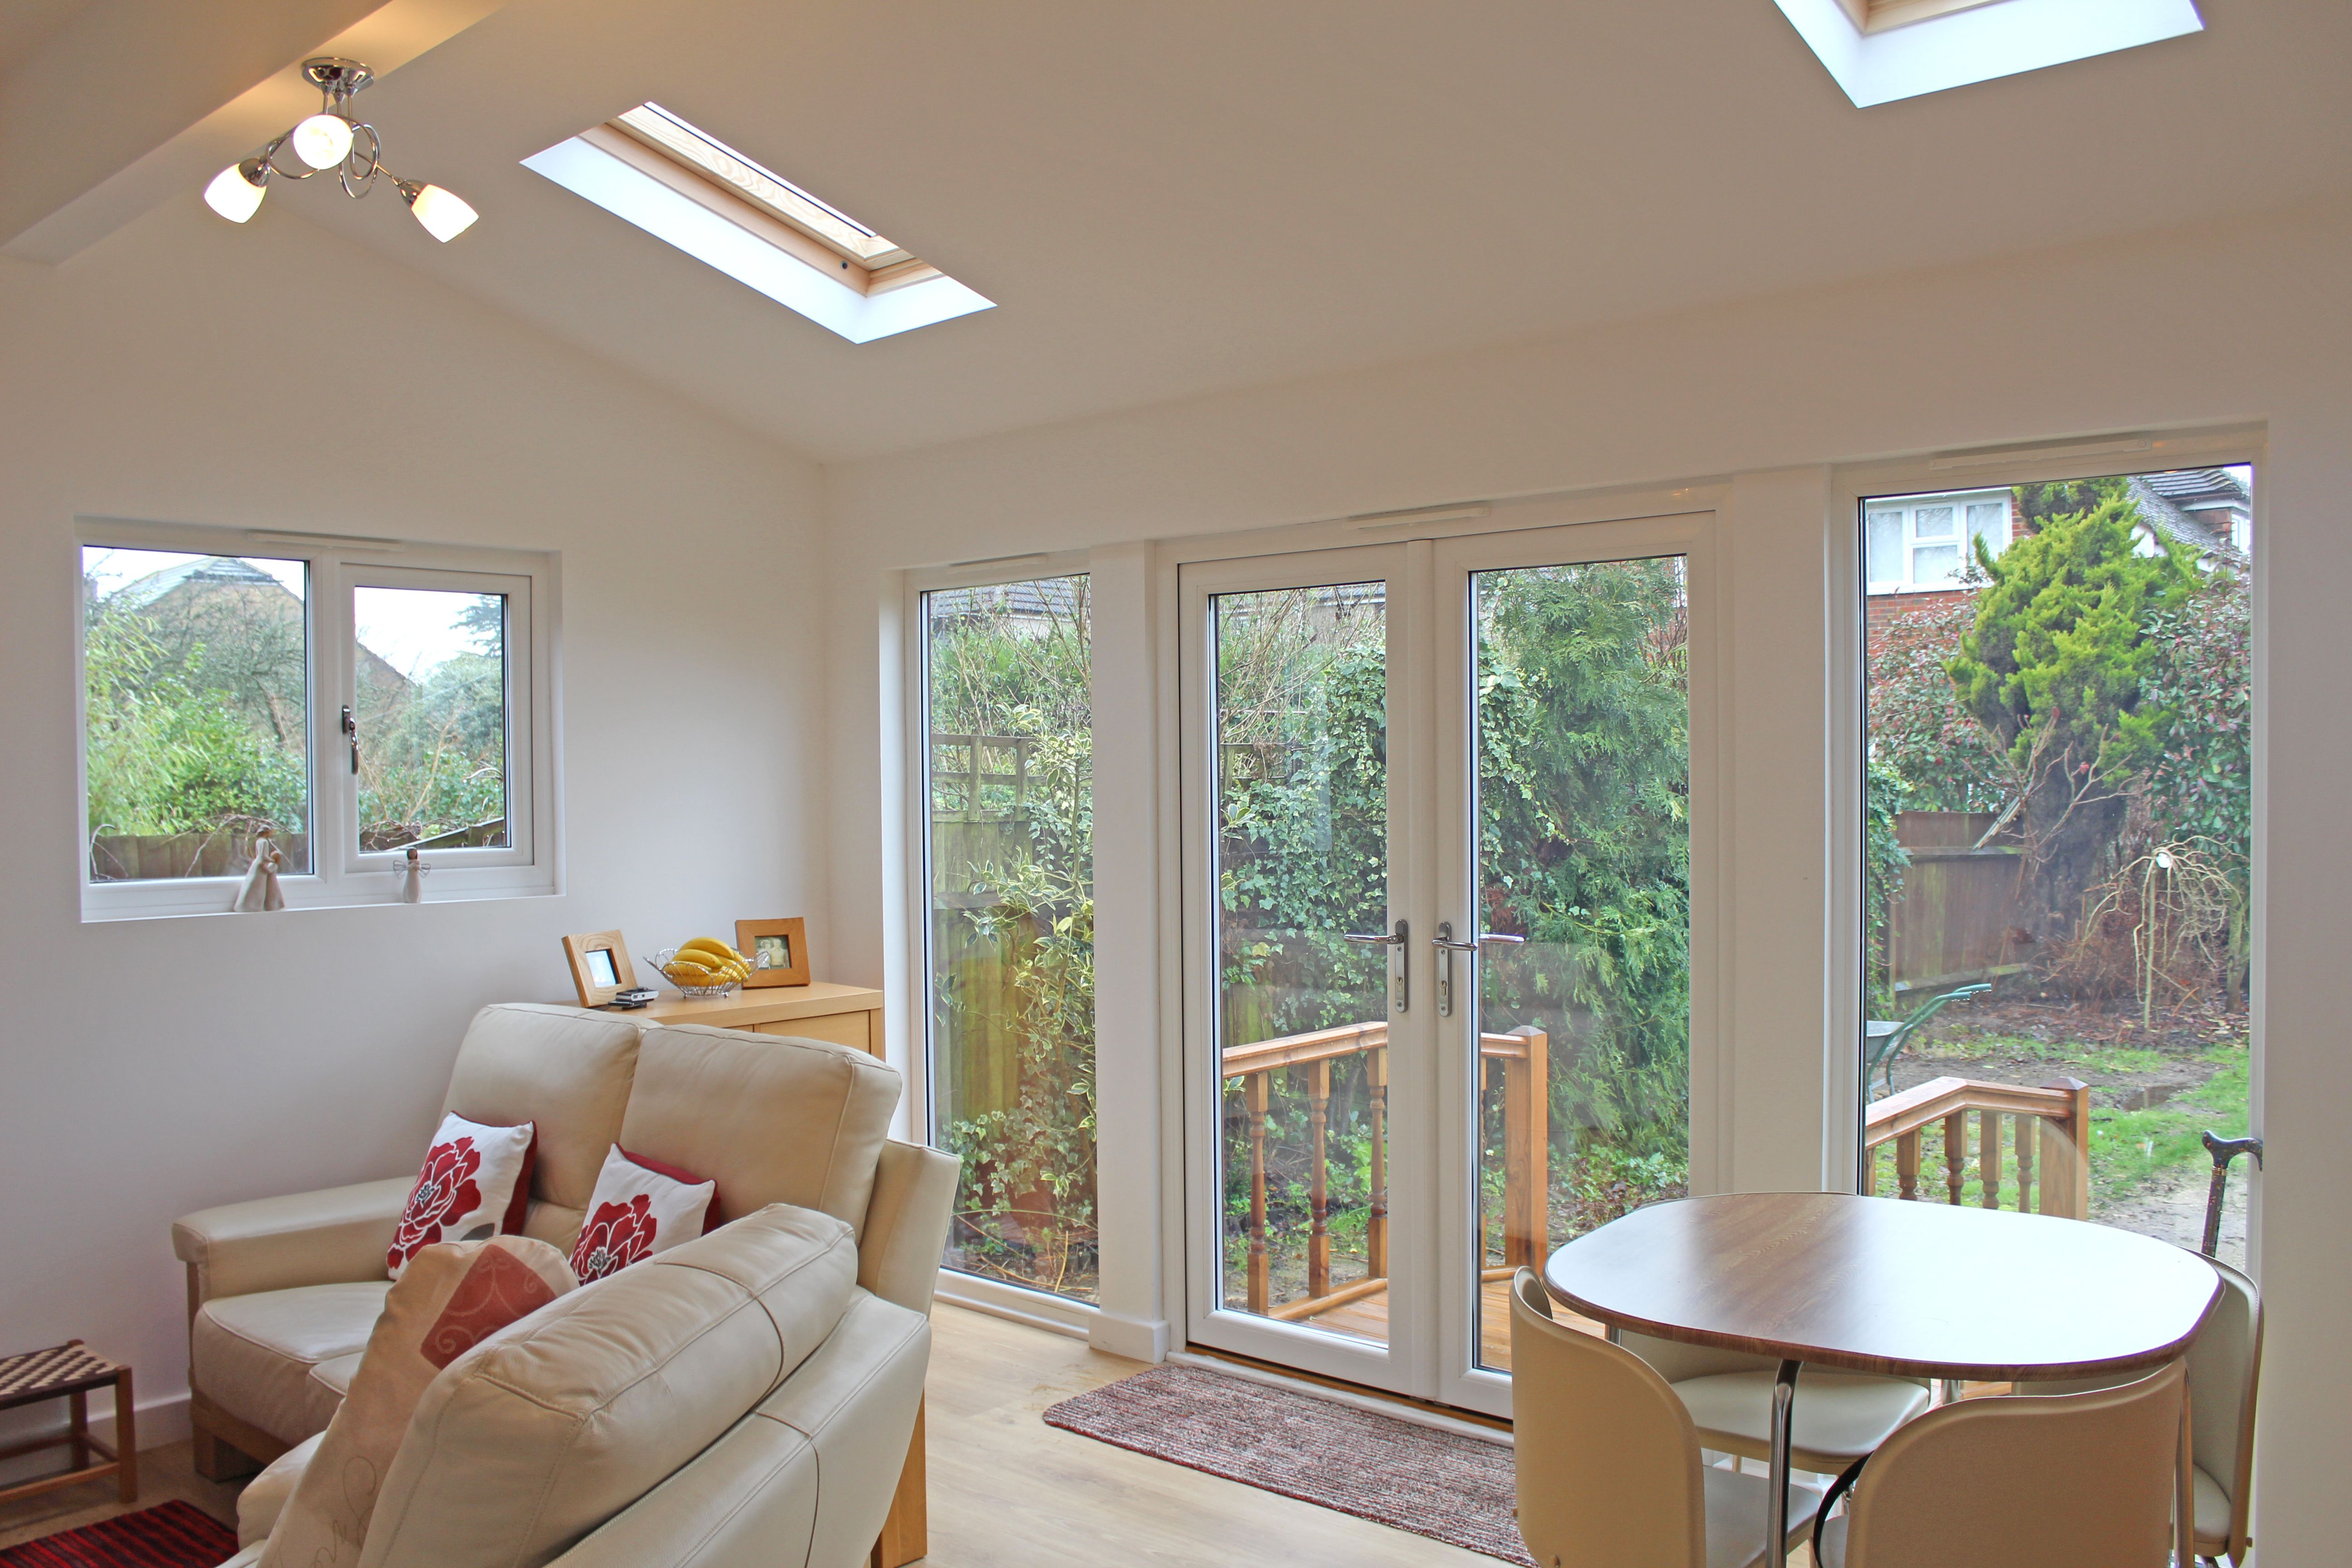 Granny Annexe Interior In Kent, UK. Granny Annexe Built By